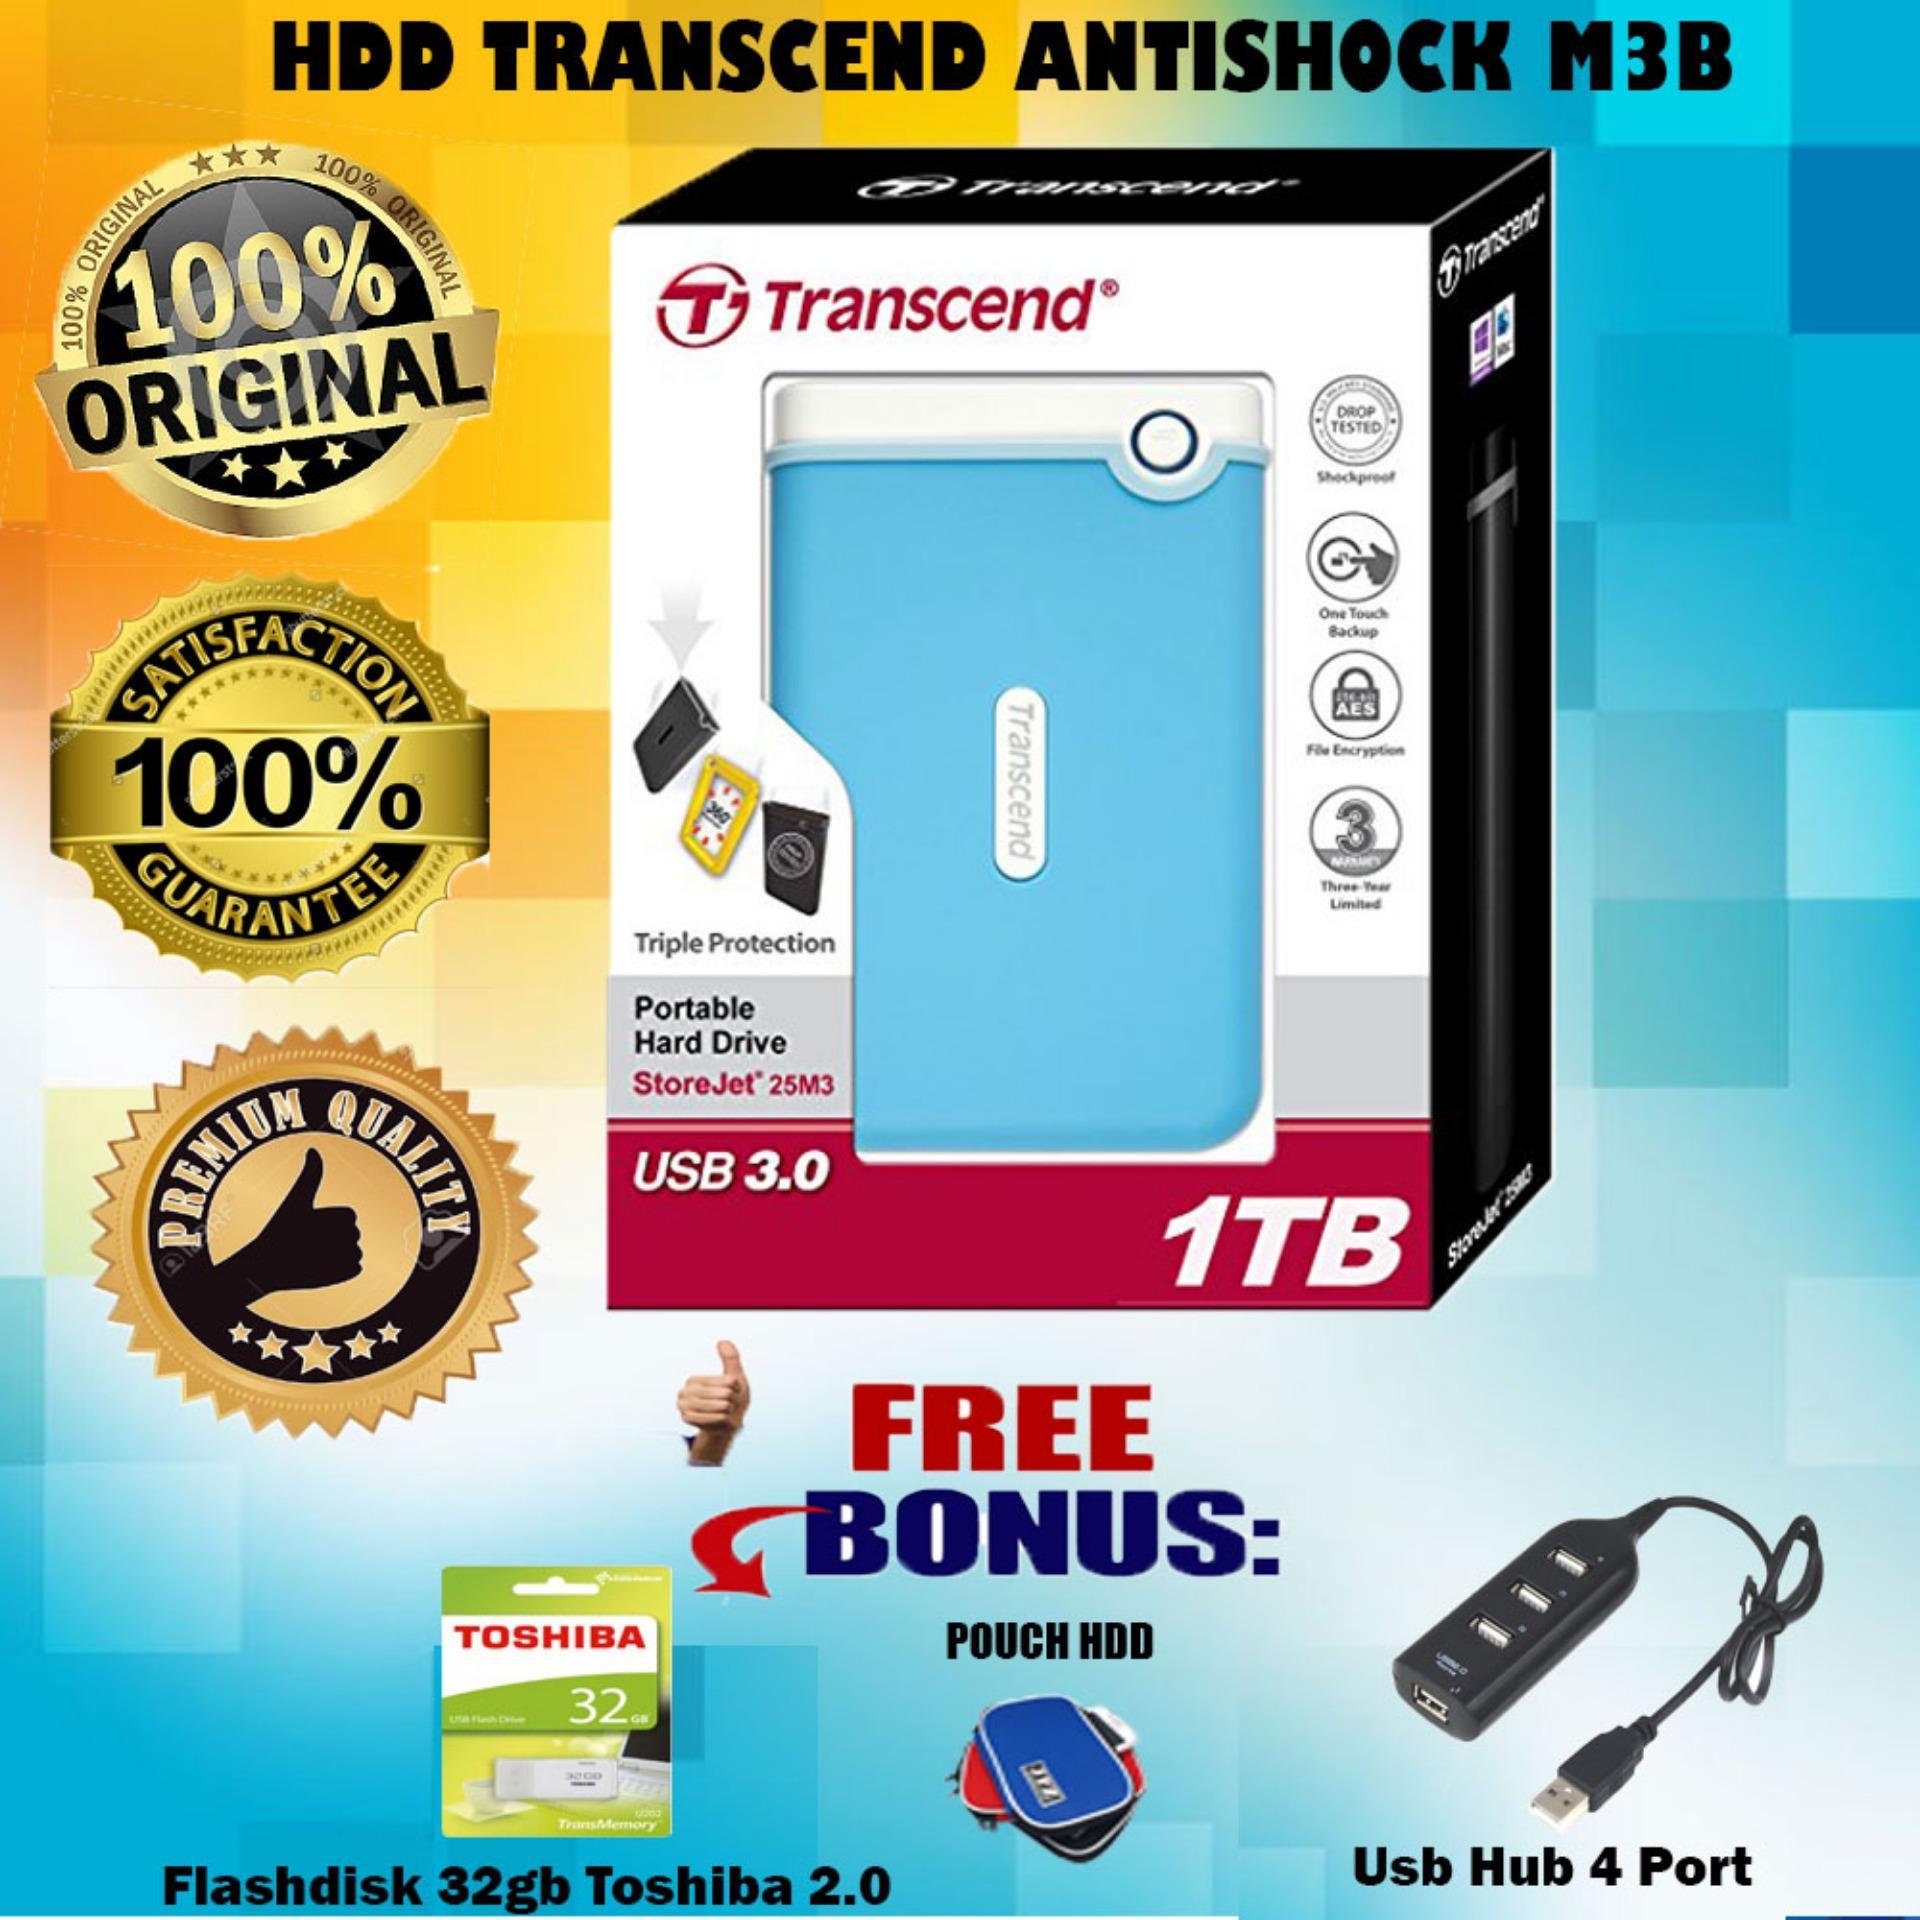 Transcend Hard Drive Harddisk External Anti Banting Antishock 1tb Flasdisk Toshiba 32gb 25m3b Gratis Flashdisk Pouch Usb Hub 4 Port